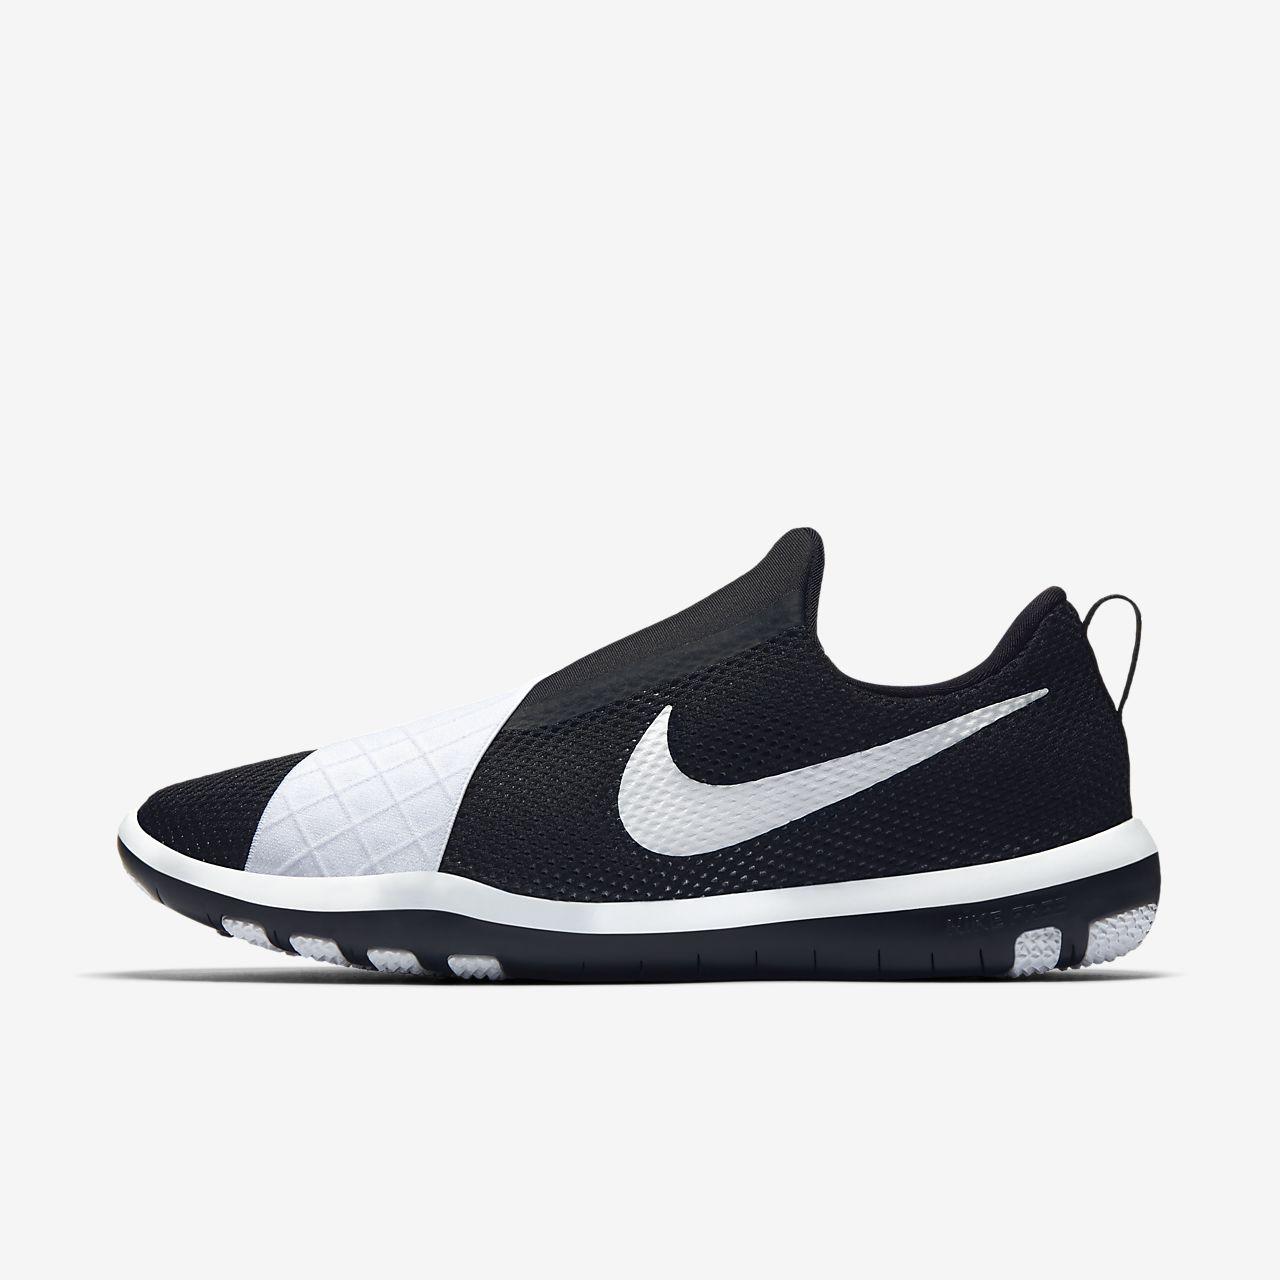 Chaussure de LU training Nike Free Connect pour LU de 4c7764